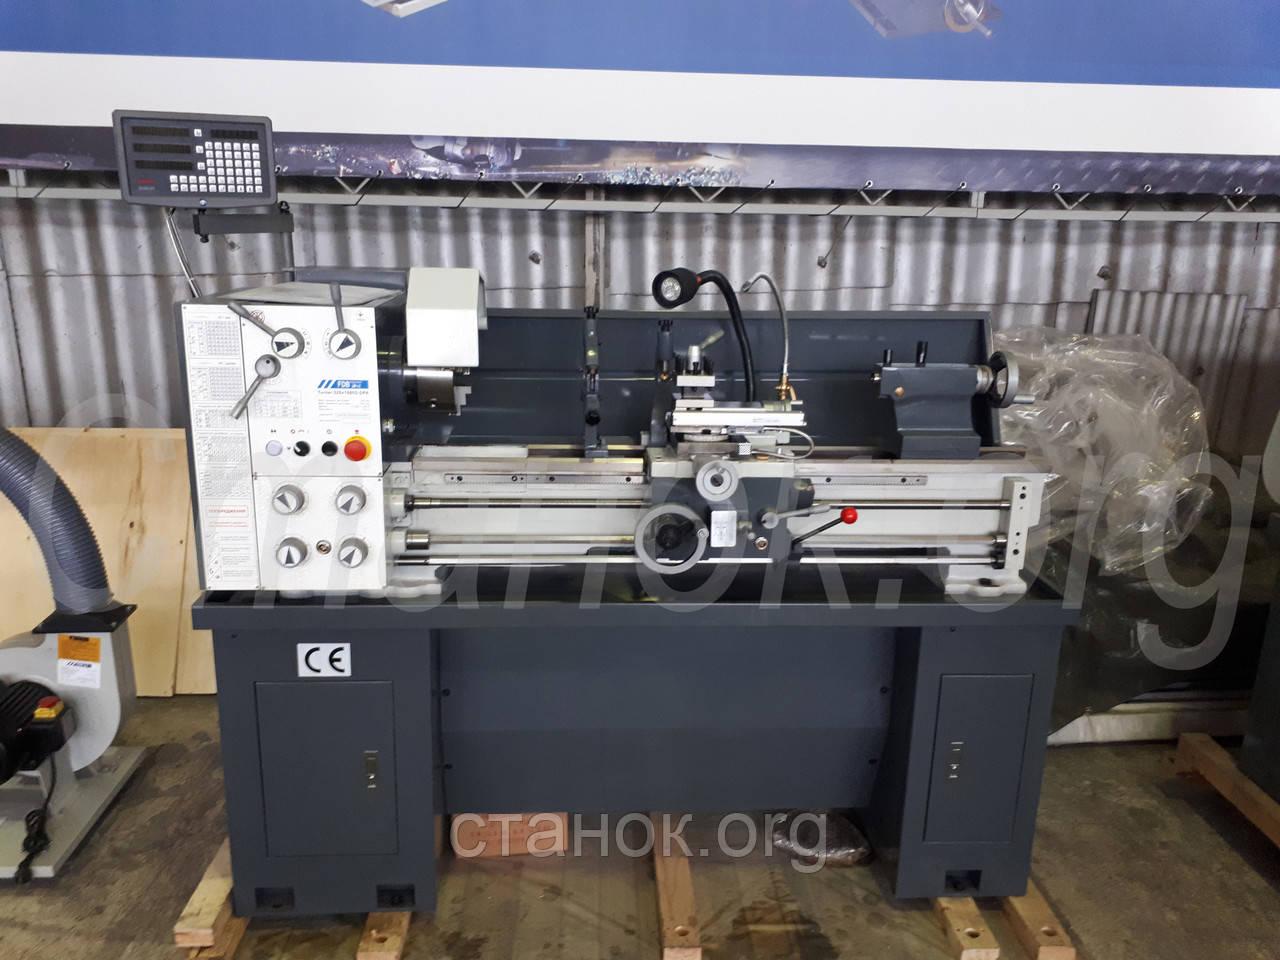 FDB Maschinen Turner 320-1000 S DPA Токарный станок по металлу винторезный фдб 320 1000 с дпа тюрнер машинен